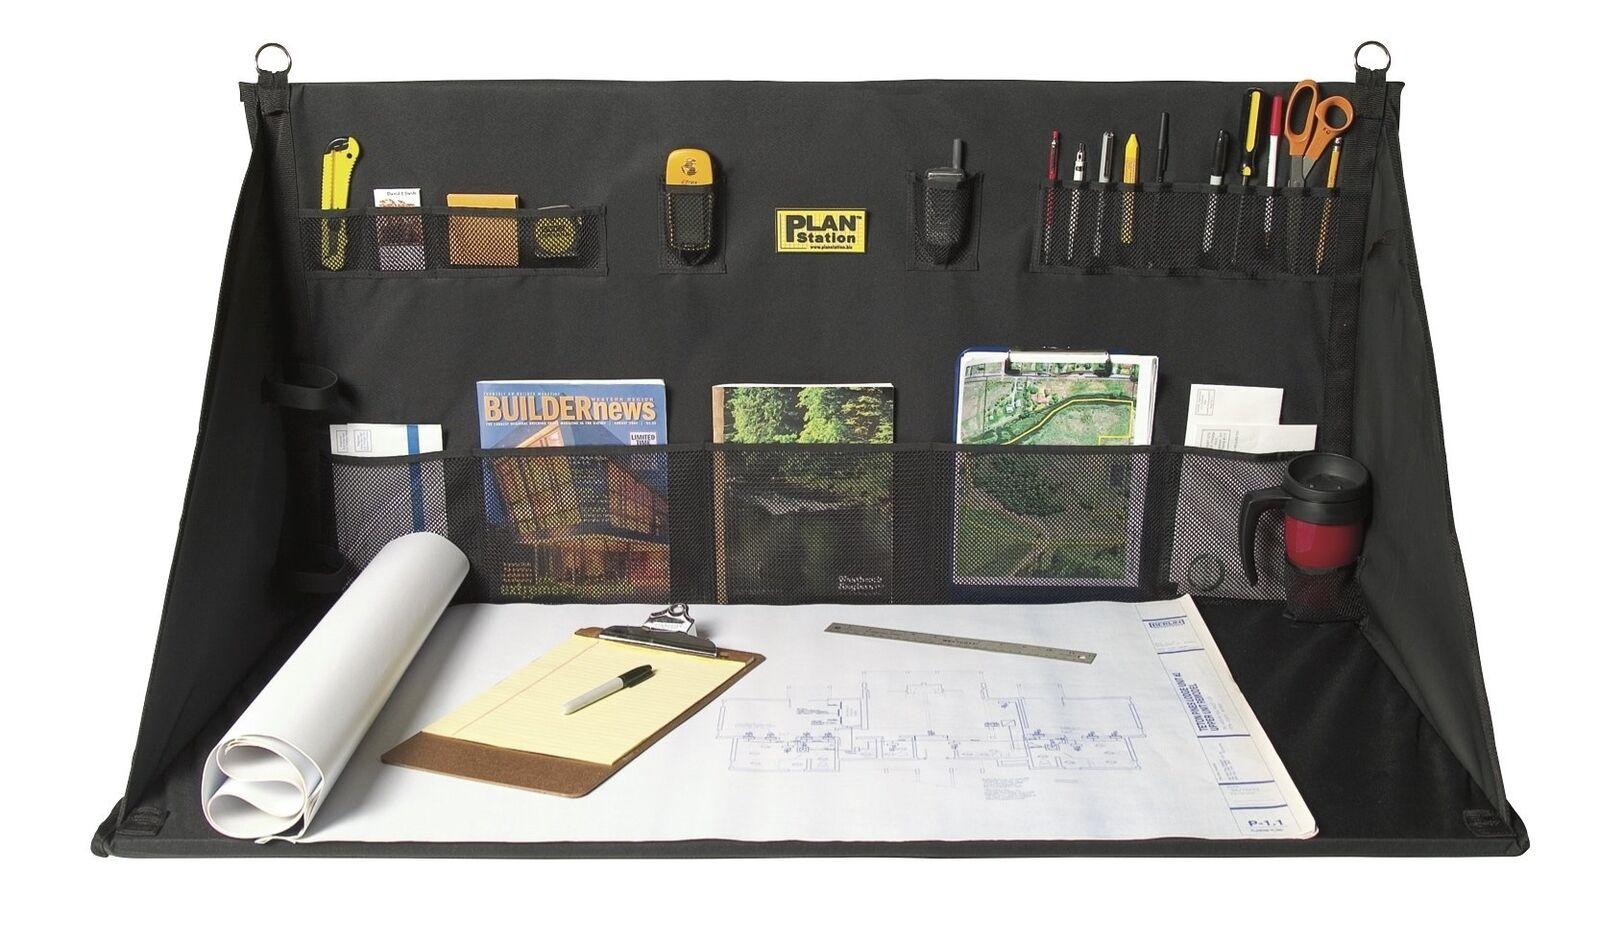 Plan Station Portable Standing Desk, Workbench, Work Station, Storage for